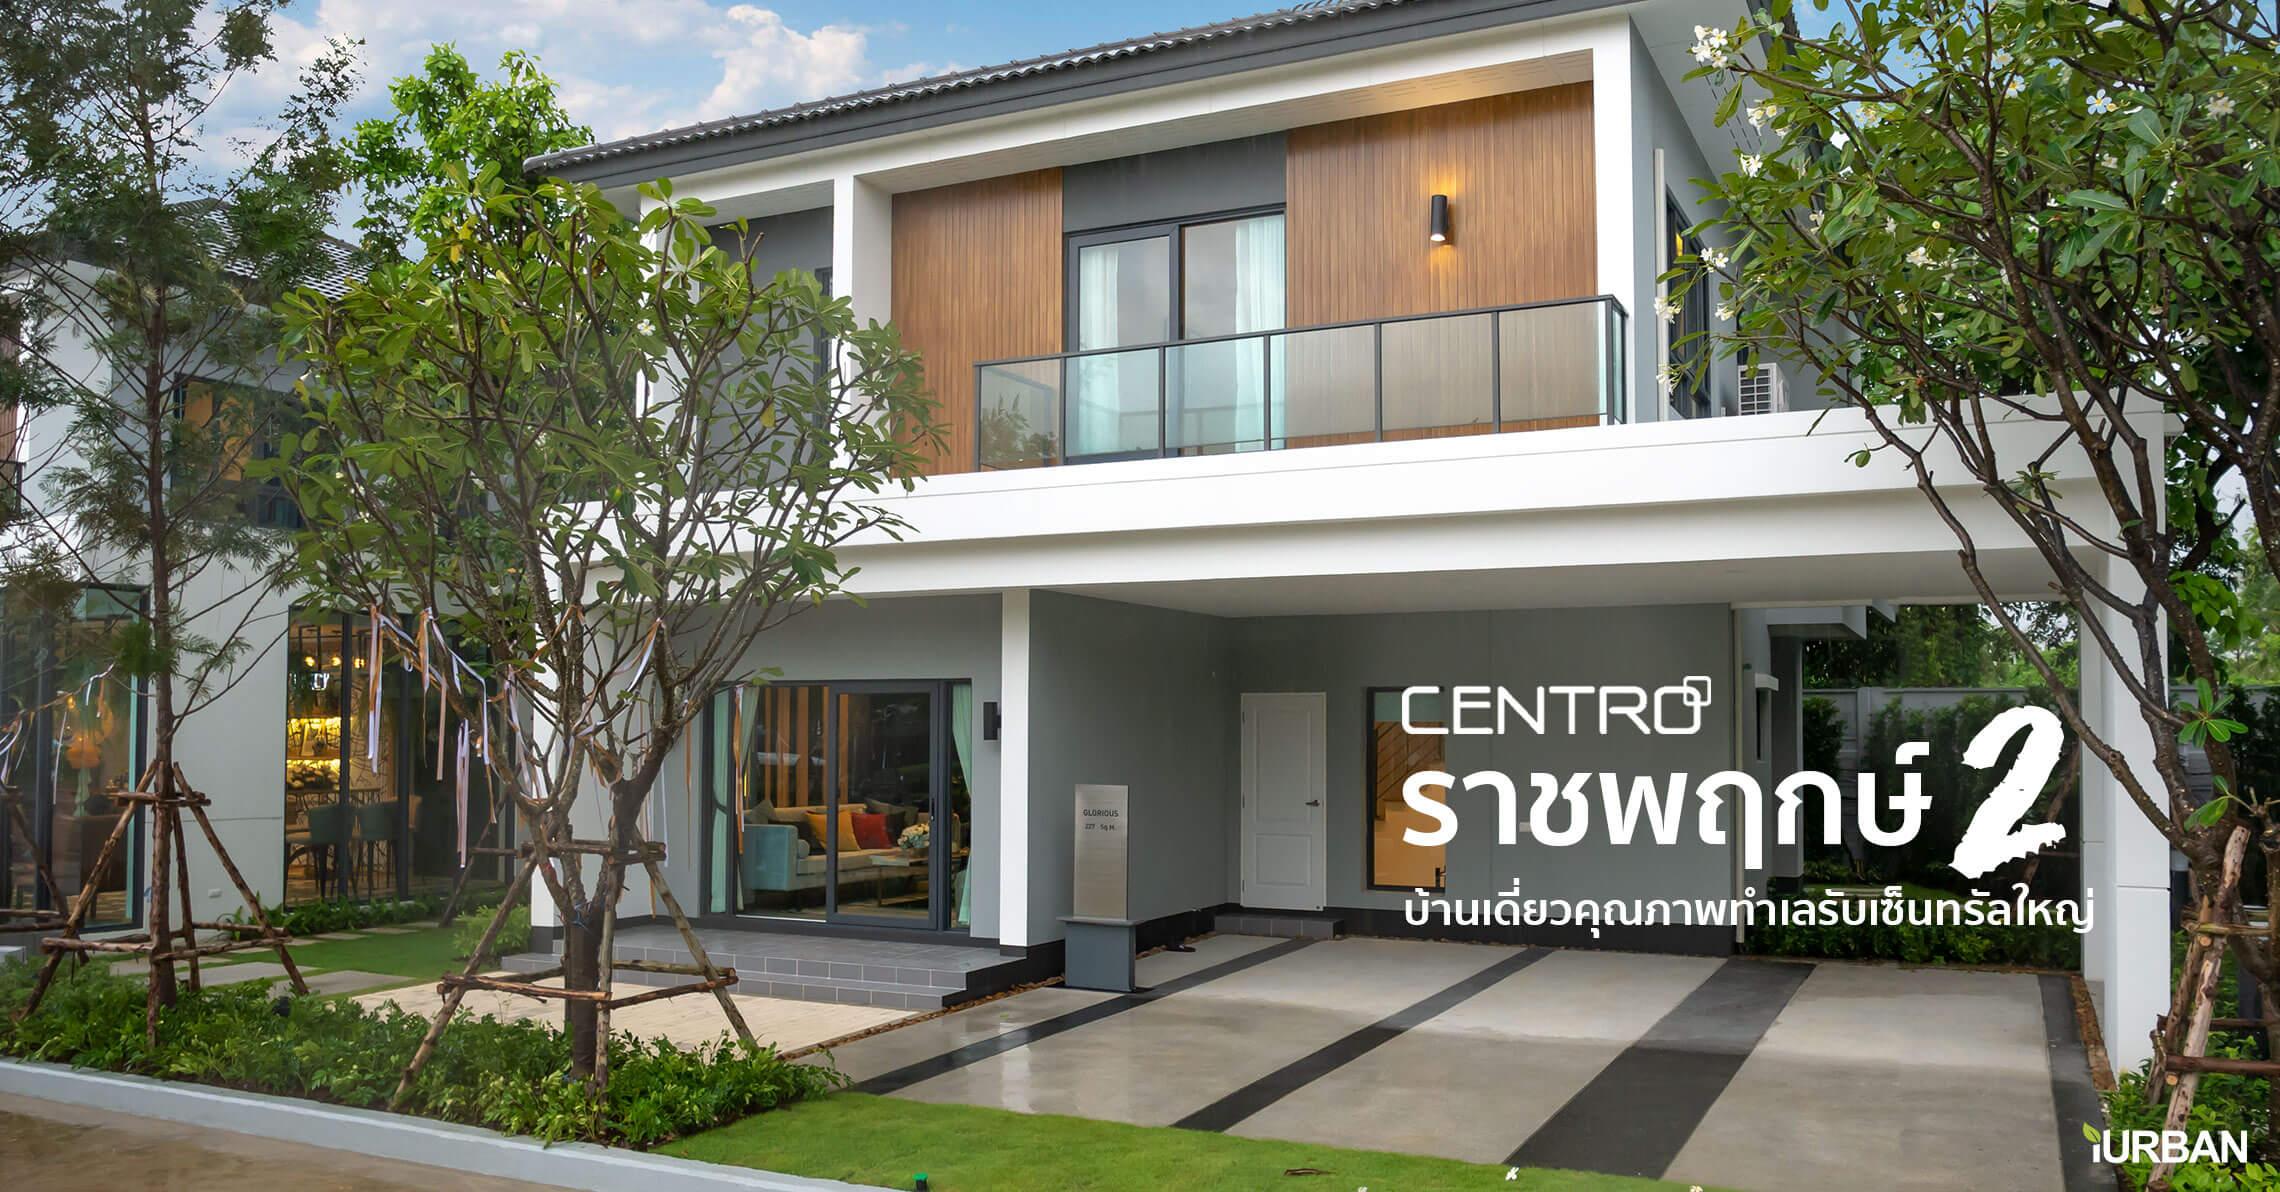 CENTRO ราชพฤกษ์ 2 ชมบ้านเดี่ยว 4 ห้องนอนของ AP บนทำเลรับการมาของเซ็นทรัลใหญ่ 13 - AP (Thailand) - เอพี (ไทยแลนด์)